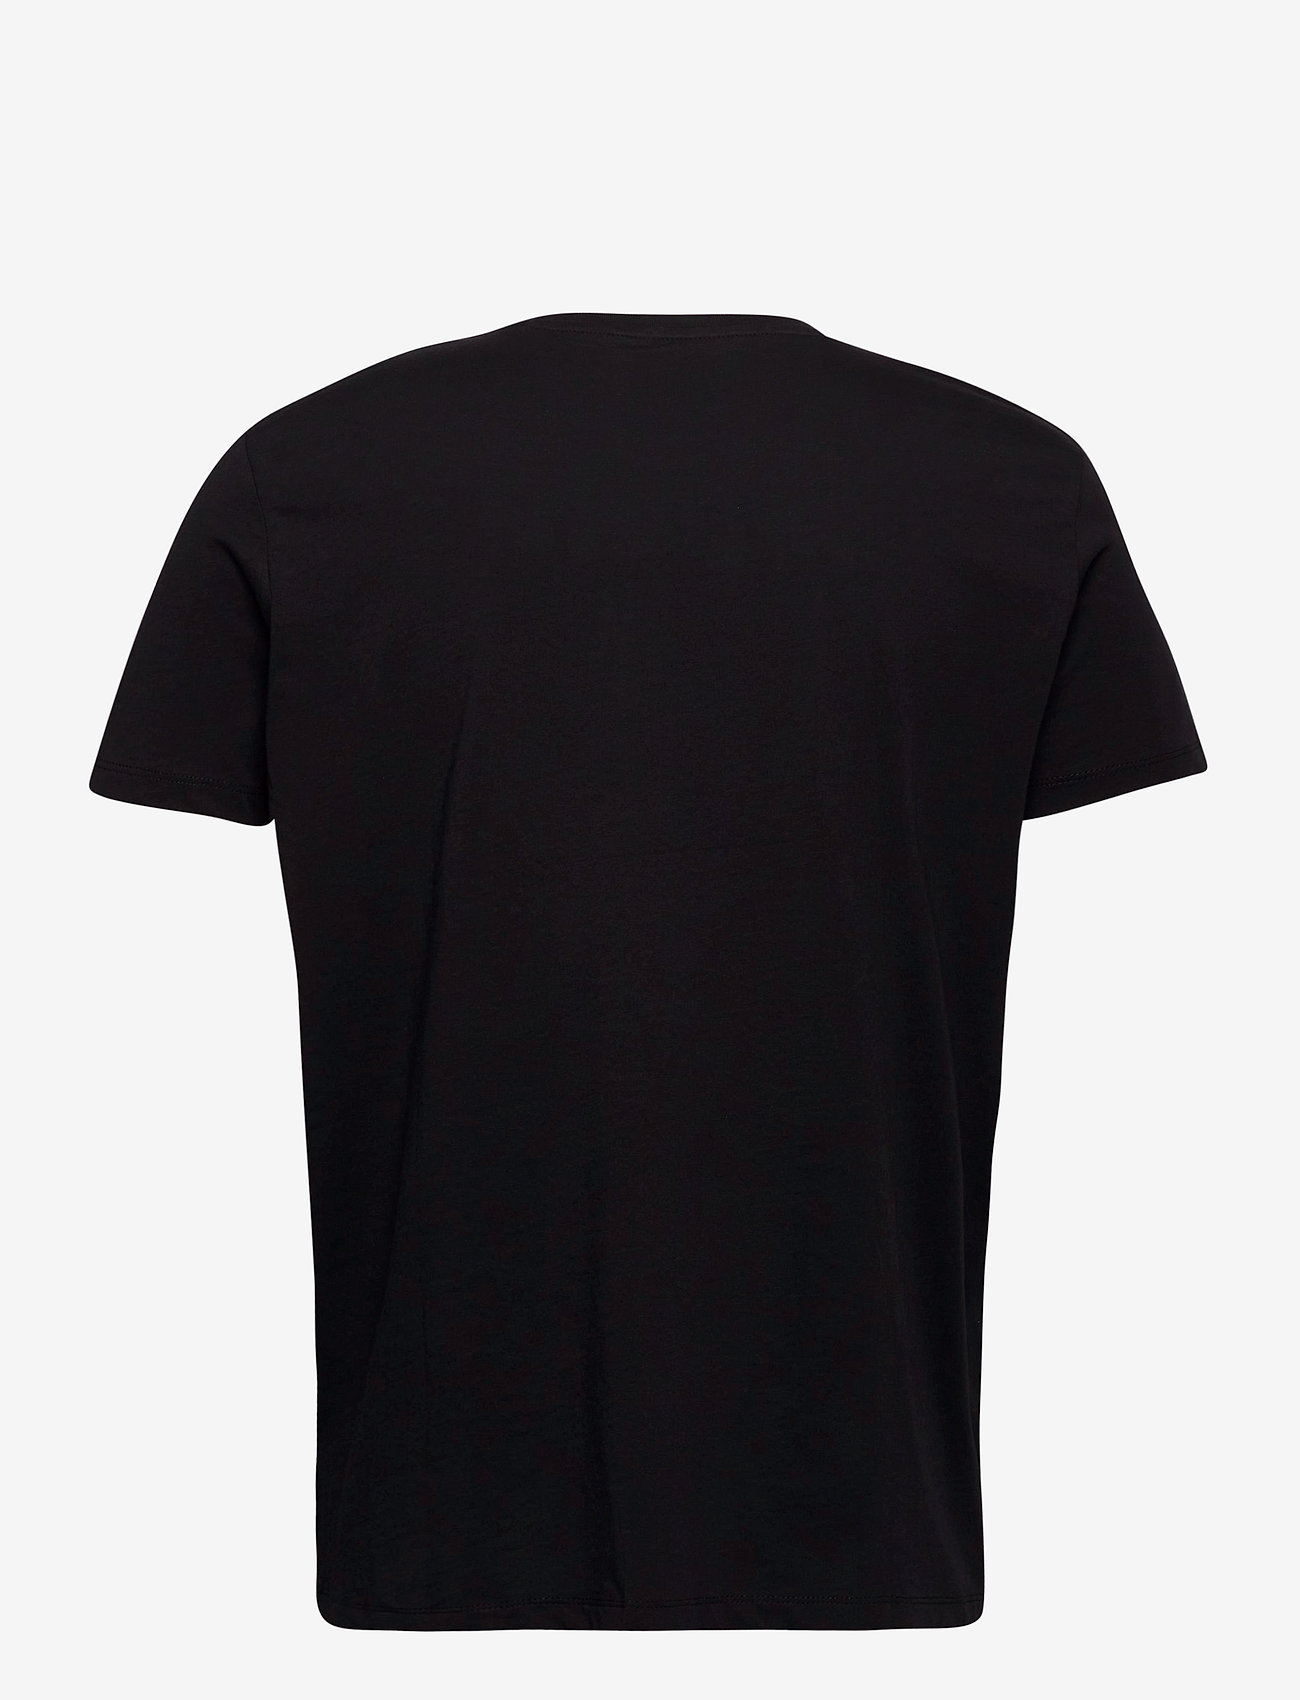 Esprit Casual - T-Shirts - korte mouwen - black - 1